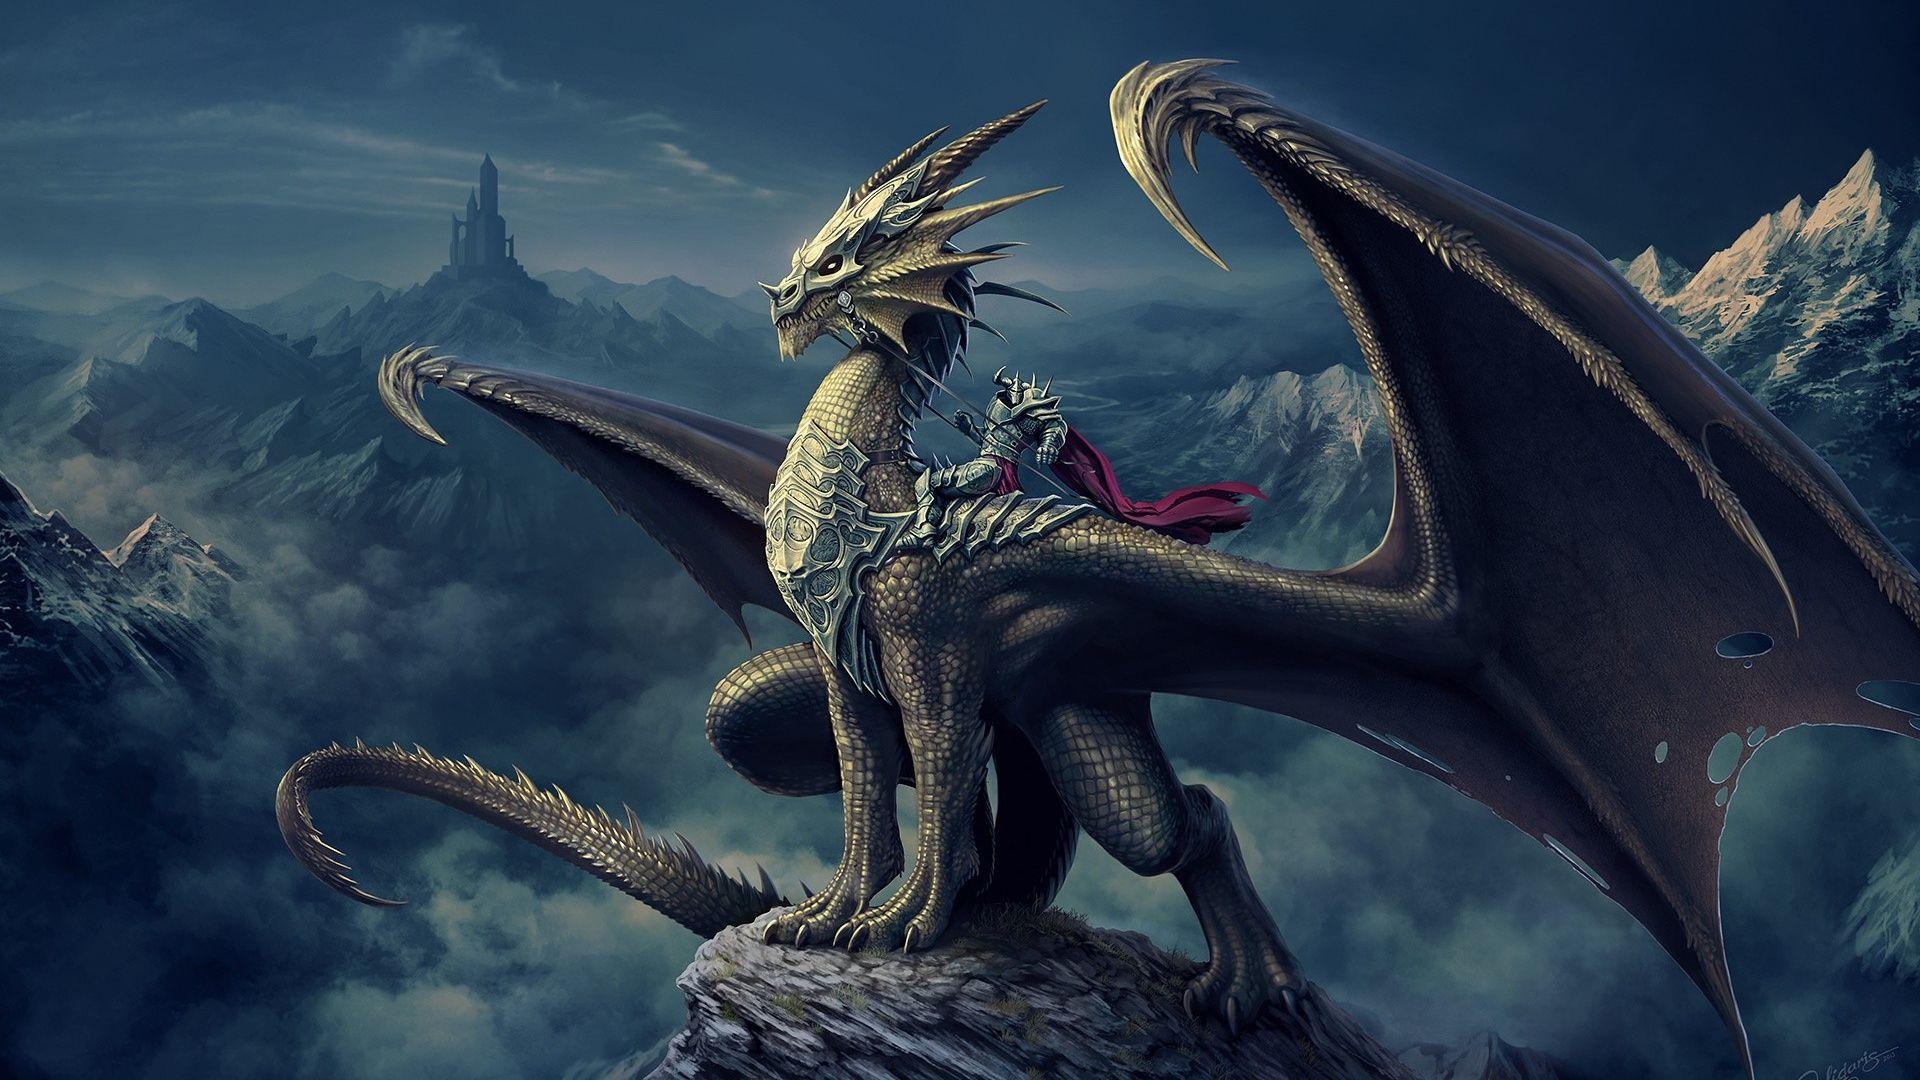 Fantastic Wallpaper Harry Potter Epic - a710b351425c820fe65624a601636603  Pictures_954173.jpg